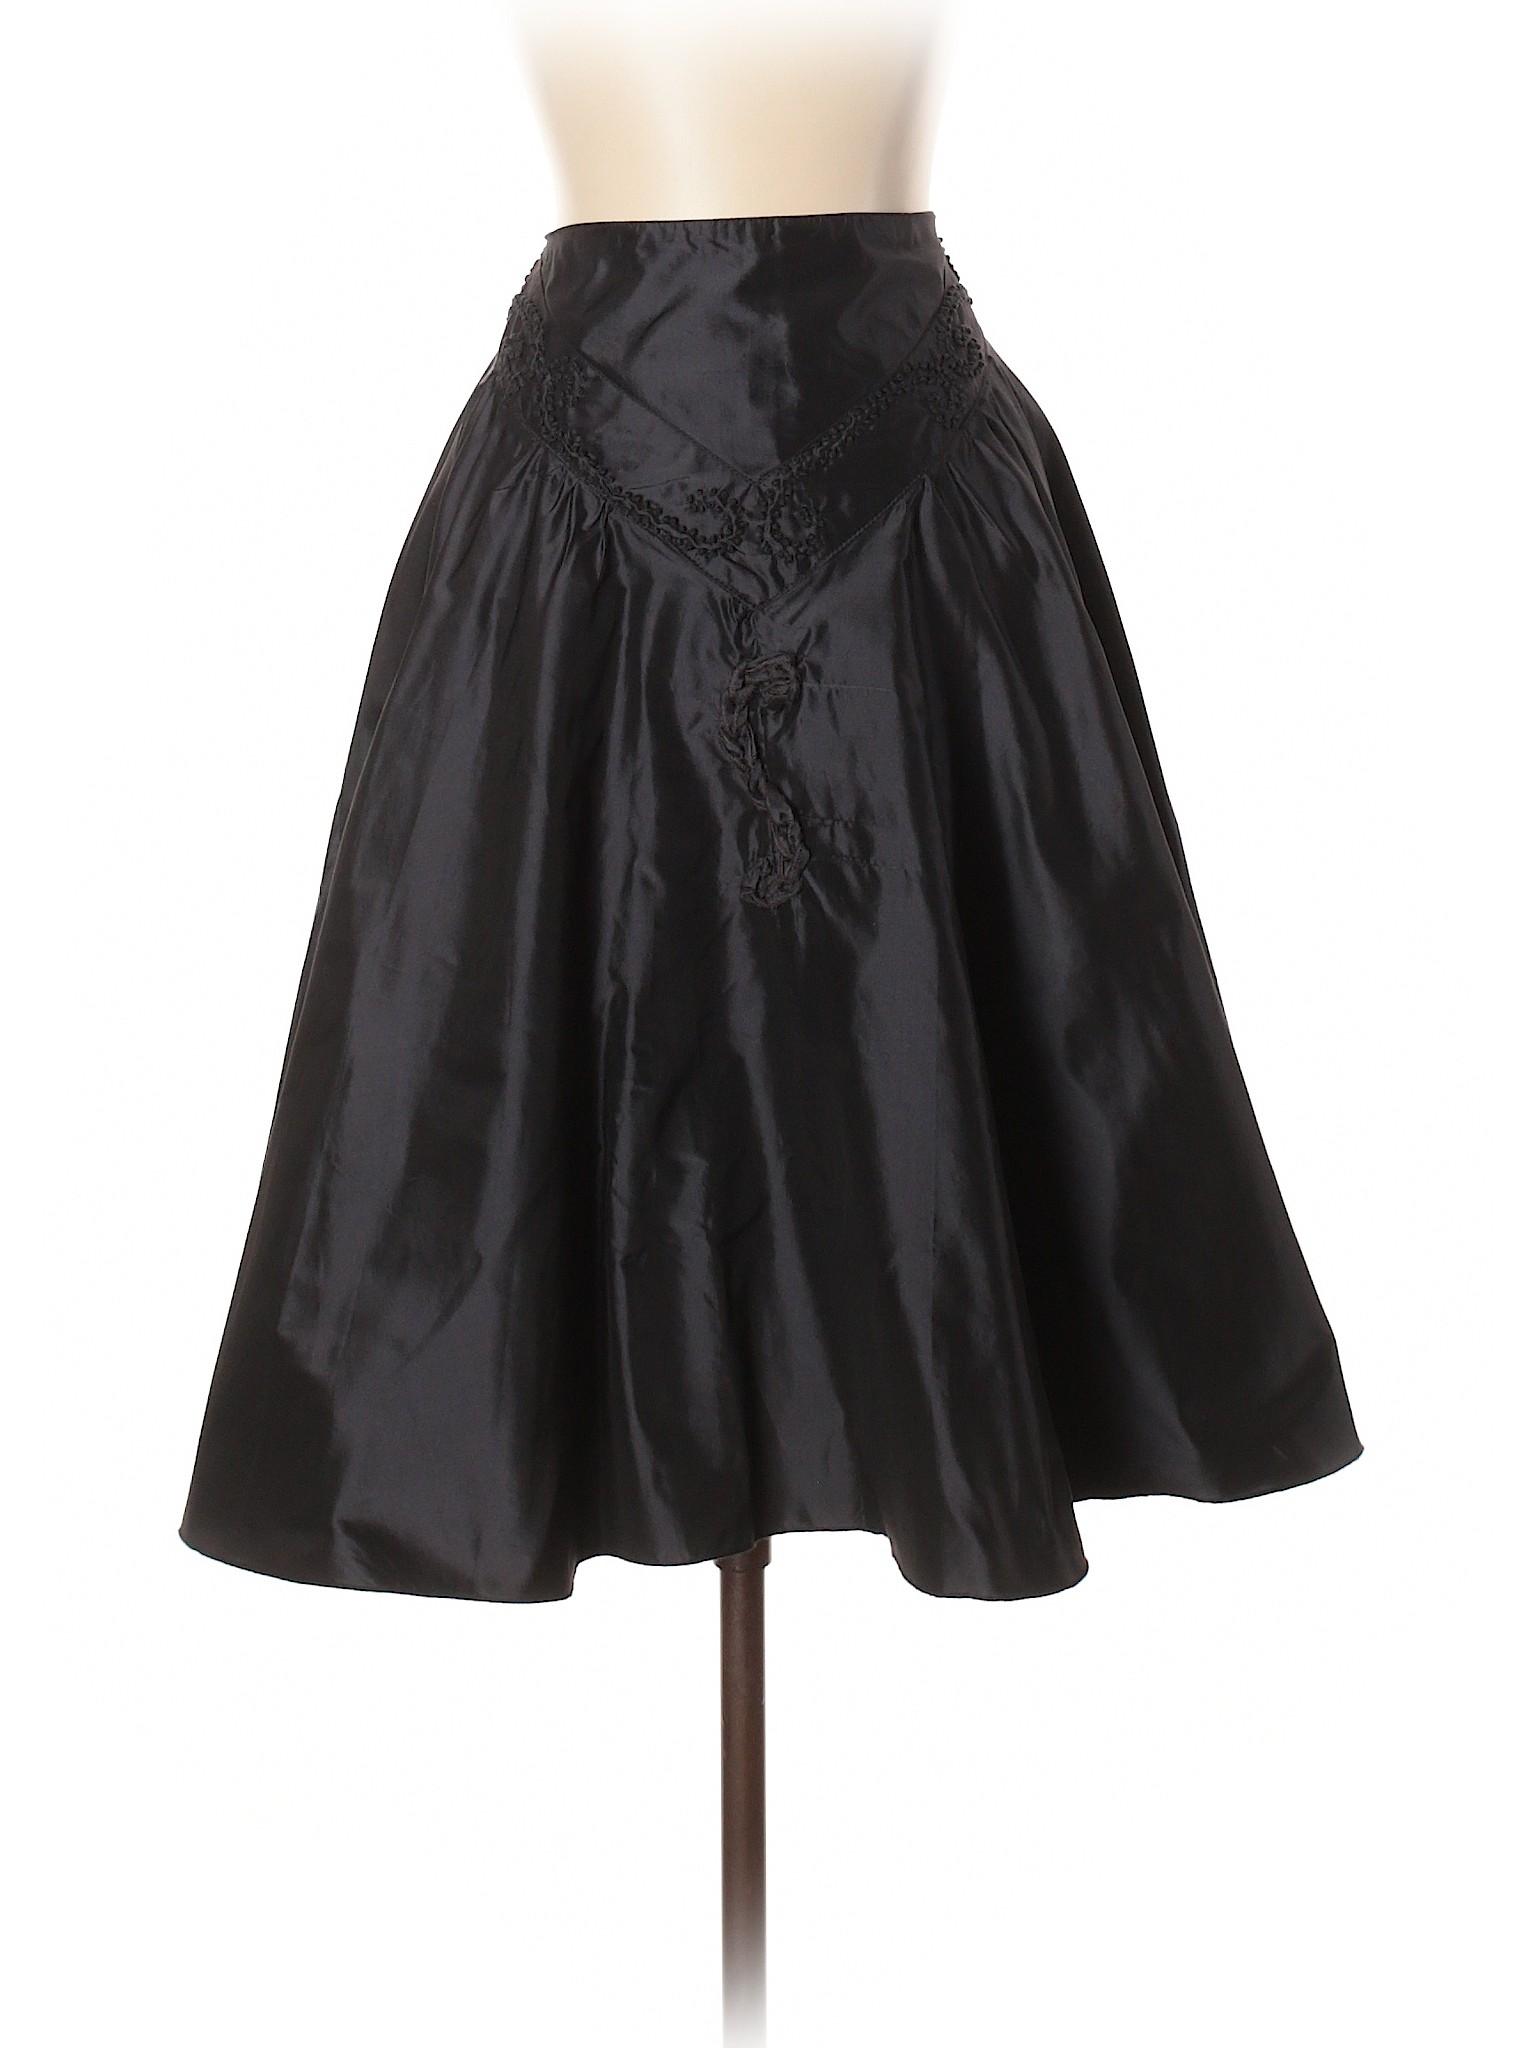 Skirt Nougat leisure Silk London Boutique nwvTRqw